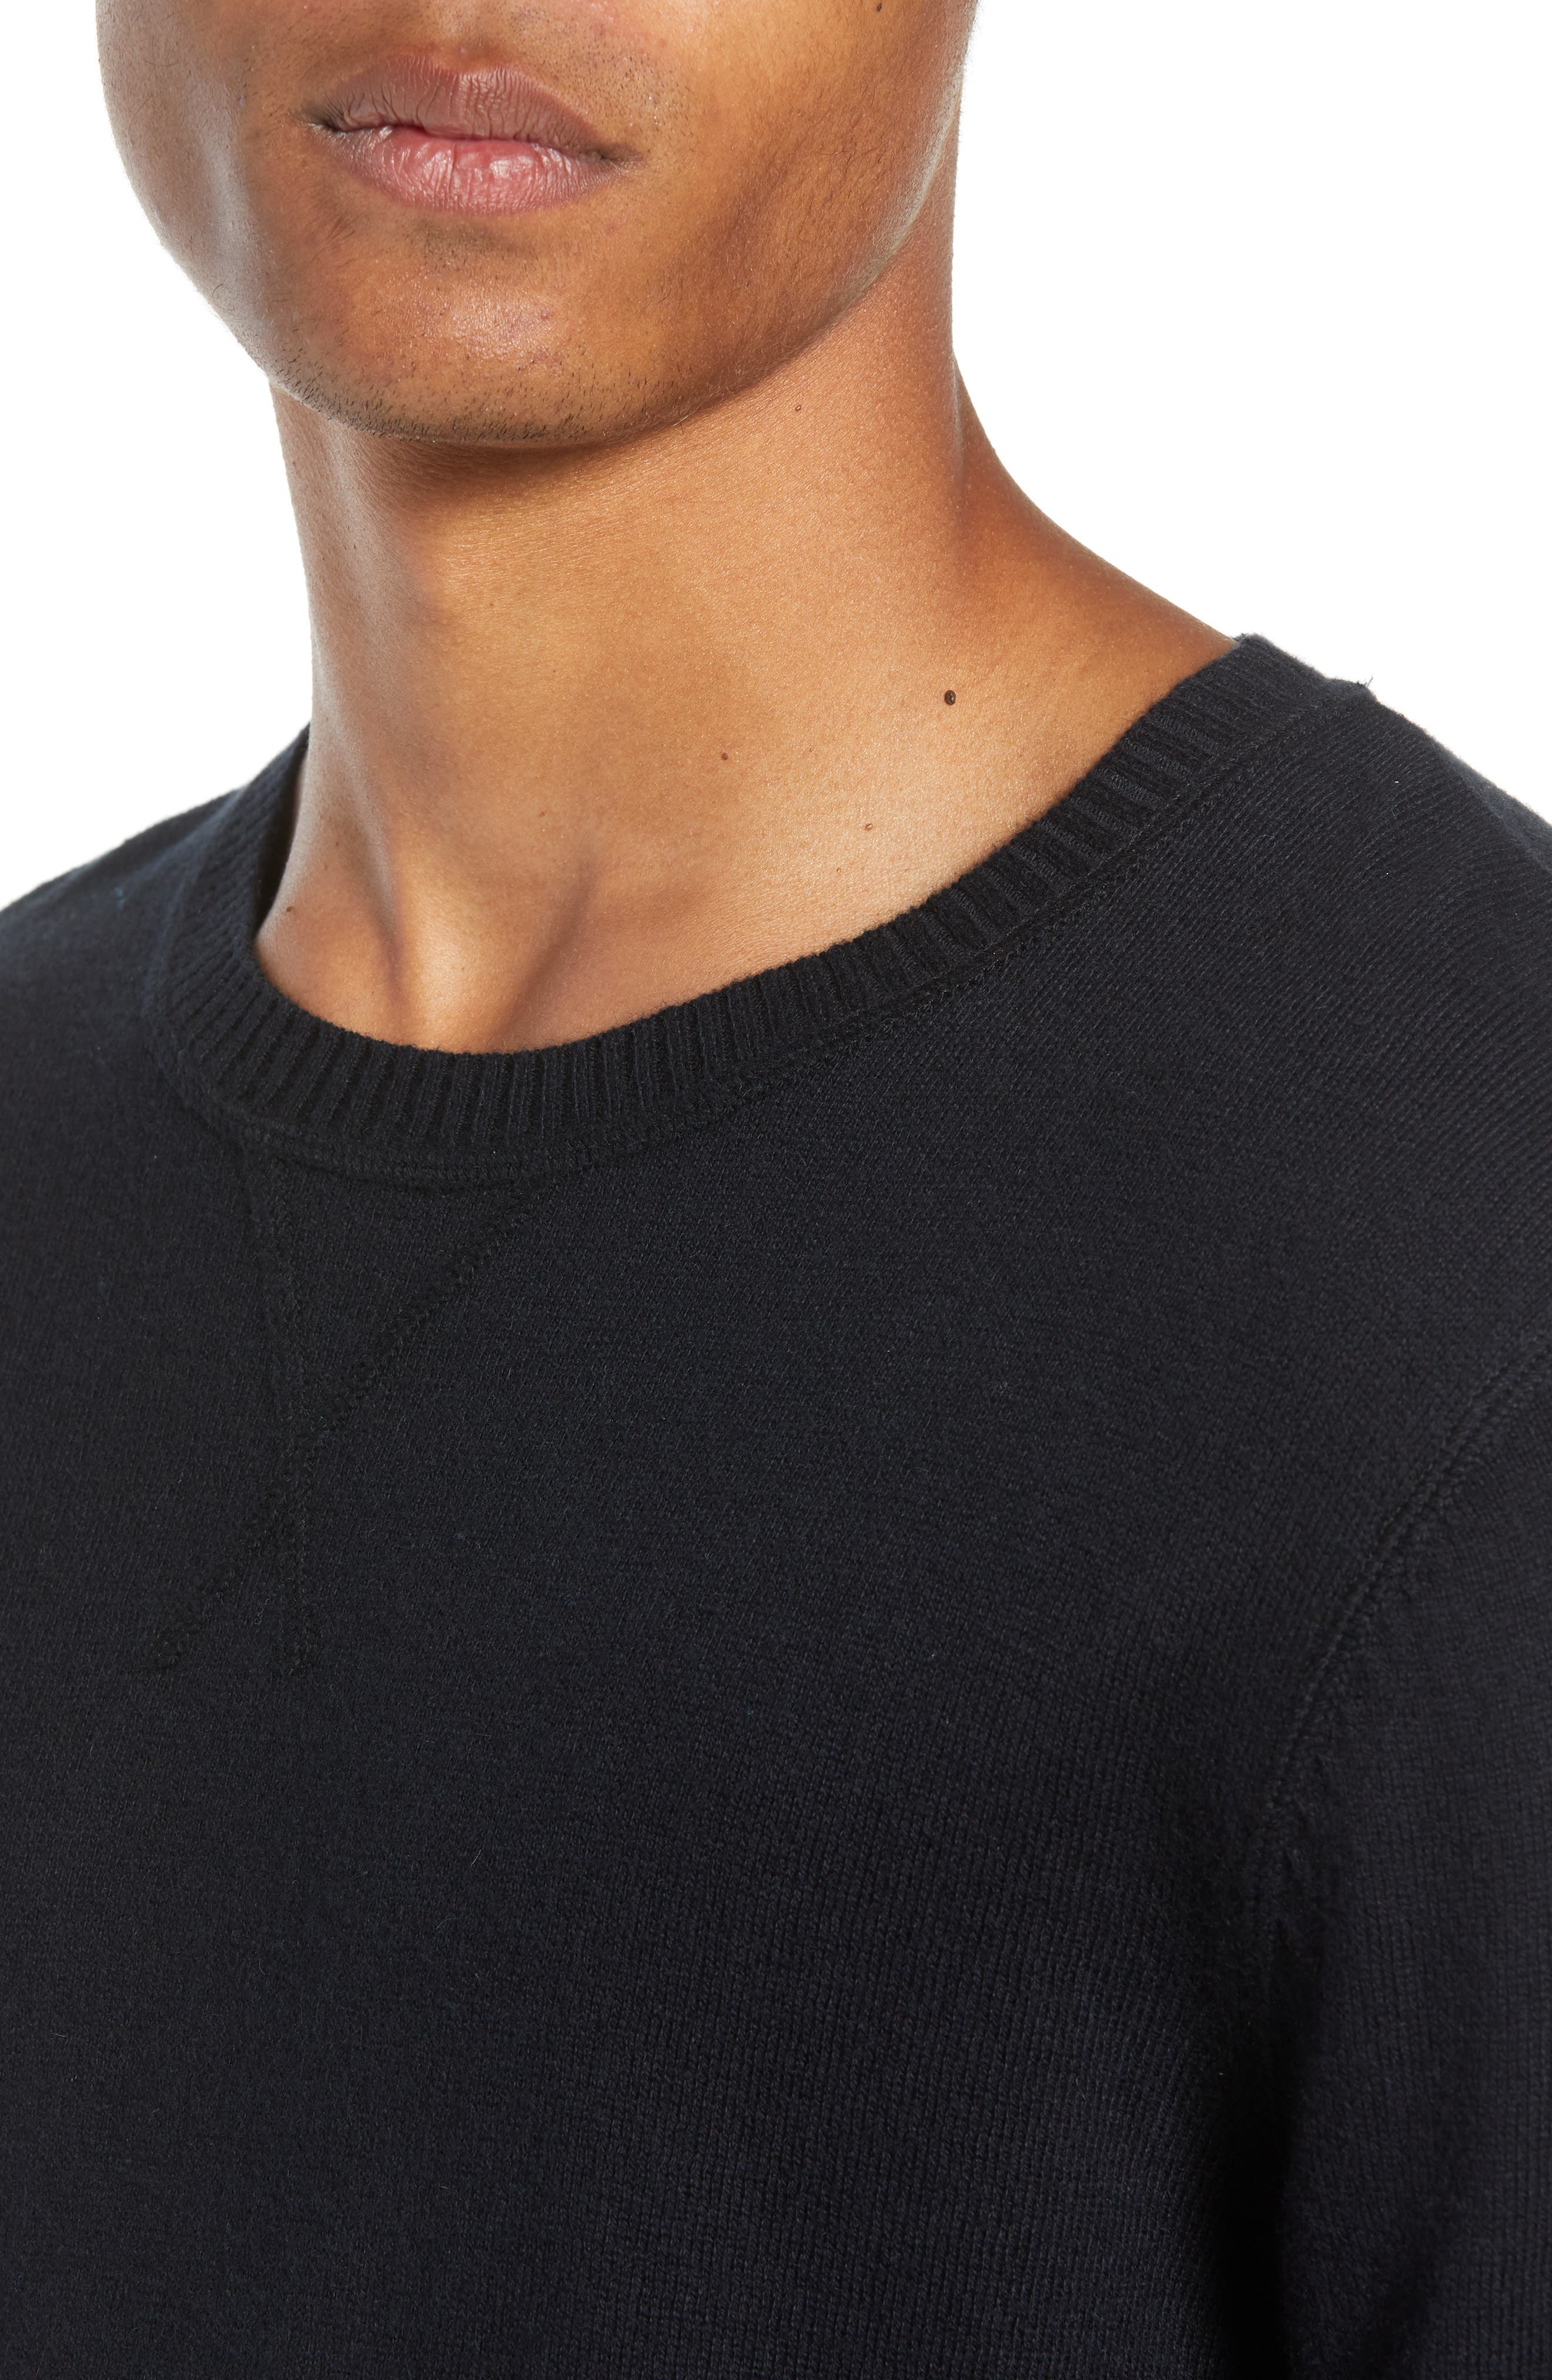 Tournament Slim Fit Crewneck Sweater,                             Alternate thumbnail 4, color,                             BLACK